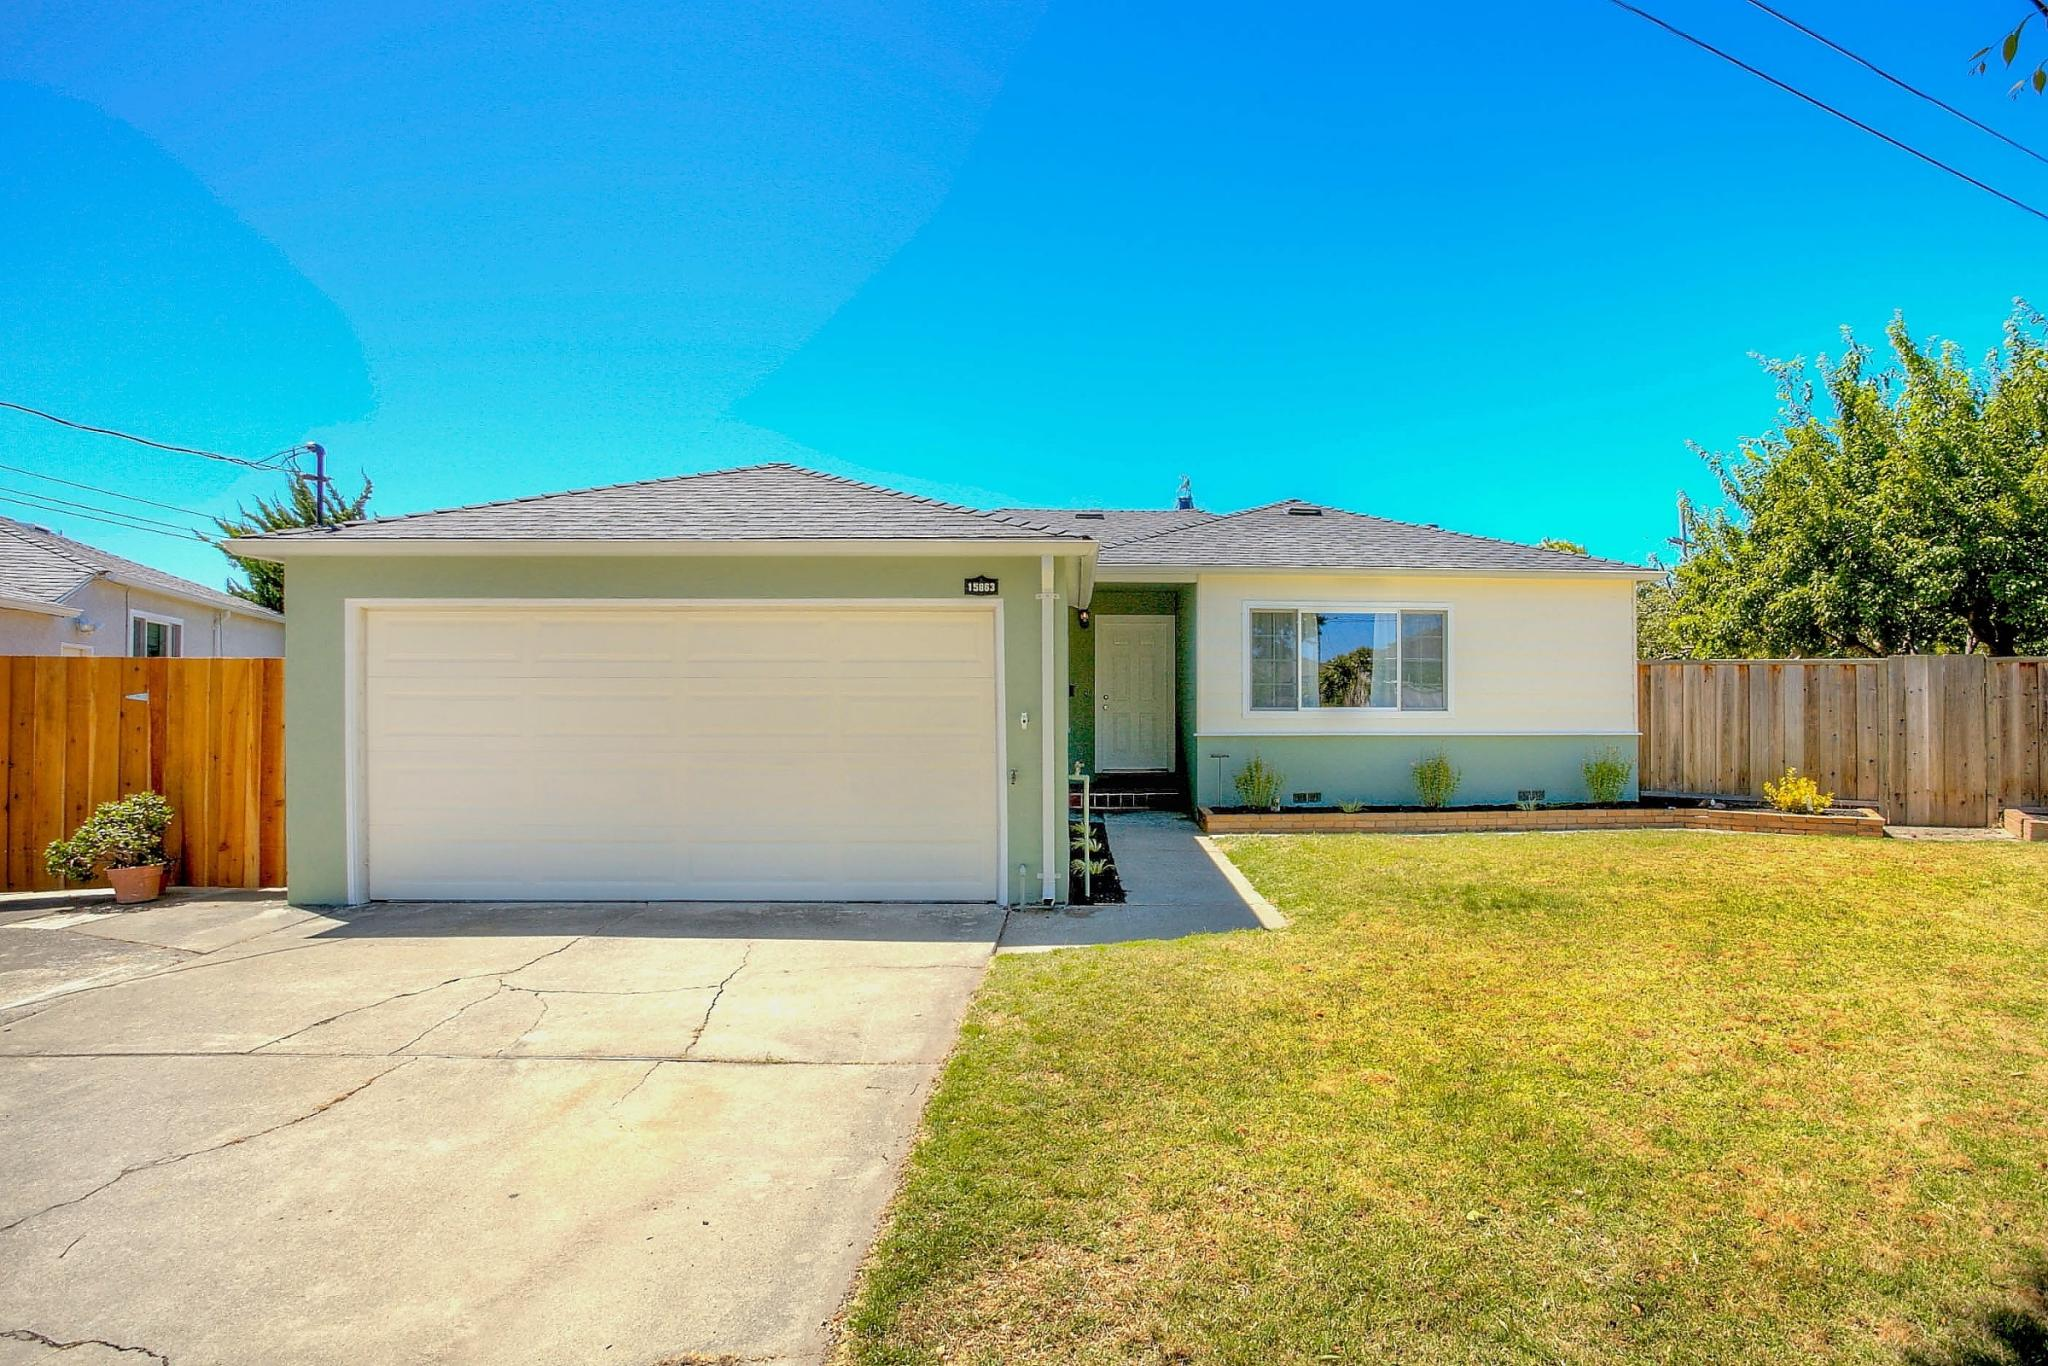 15863 Corte Geraldo, San Lorenzo, CA 94580 - Estimate and Home ...